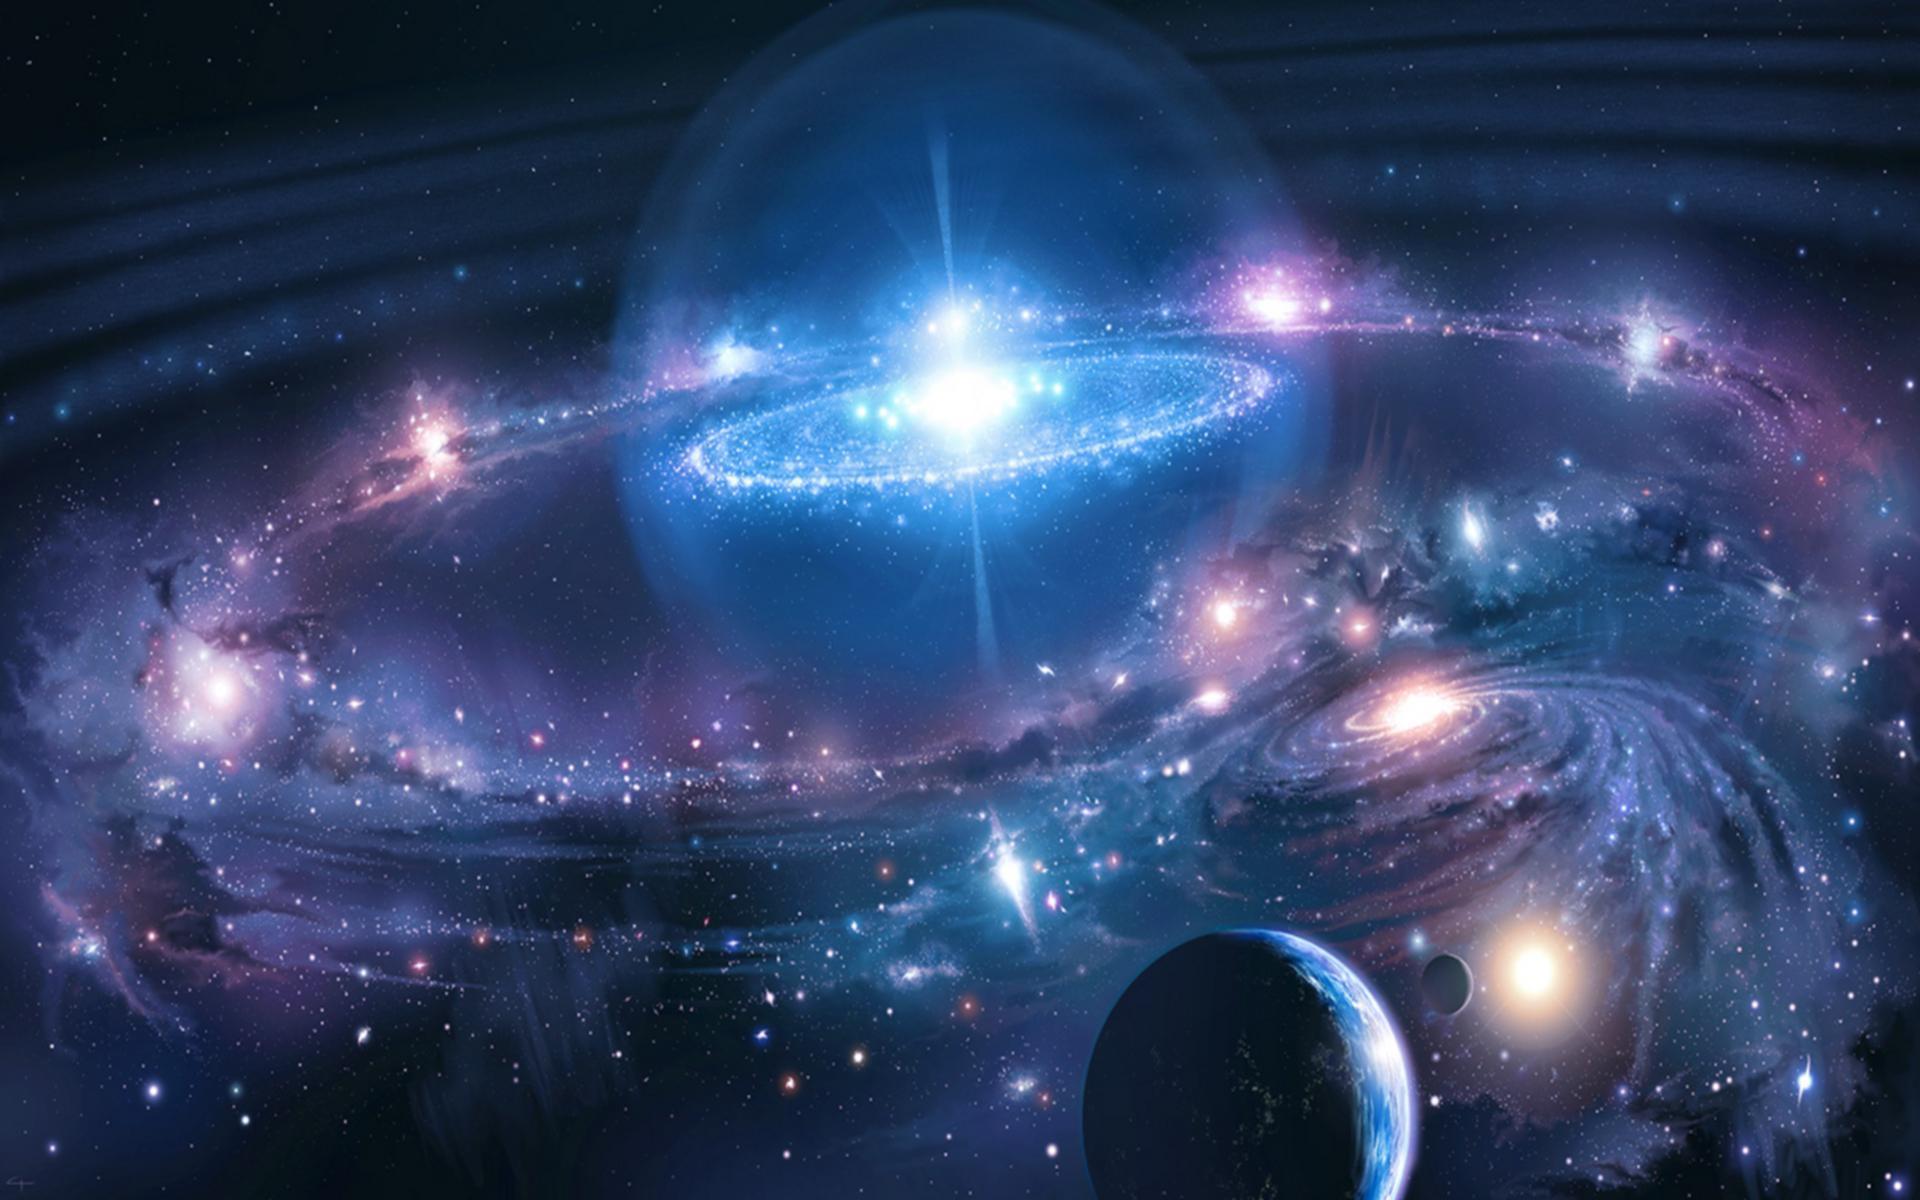 bintang luar angkasa galaksi planet gambar background hd